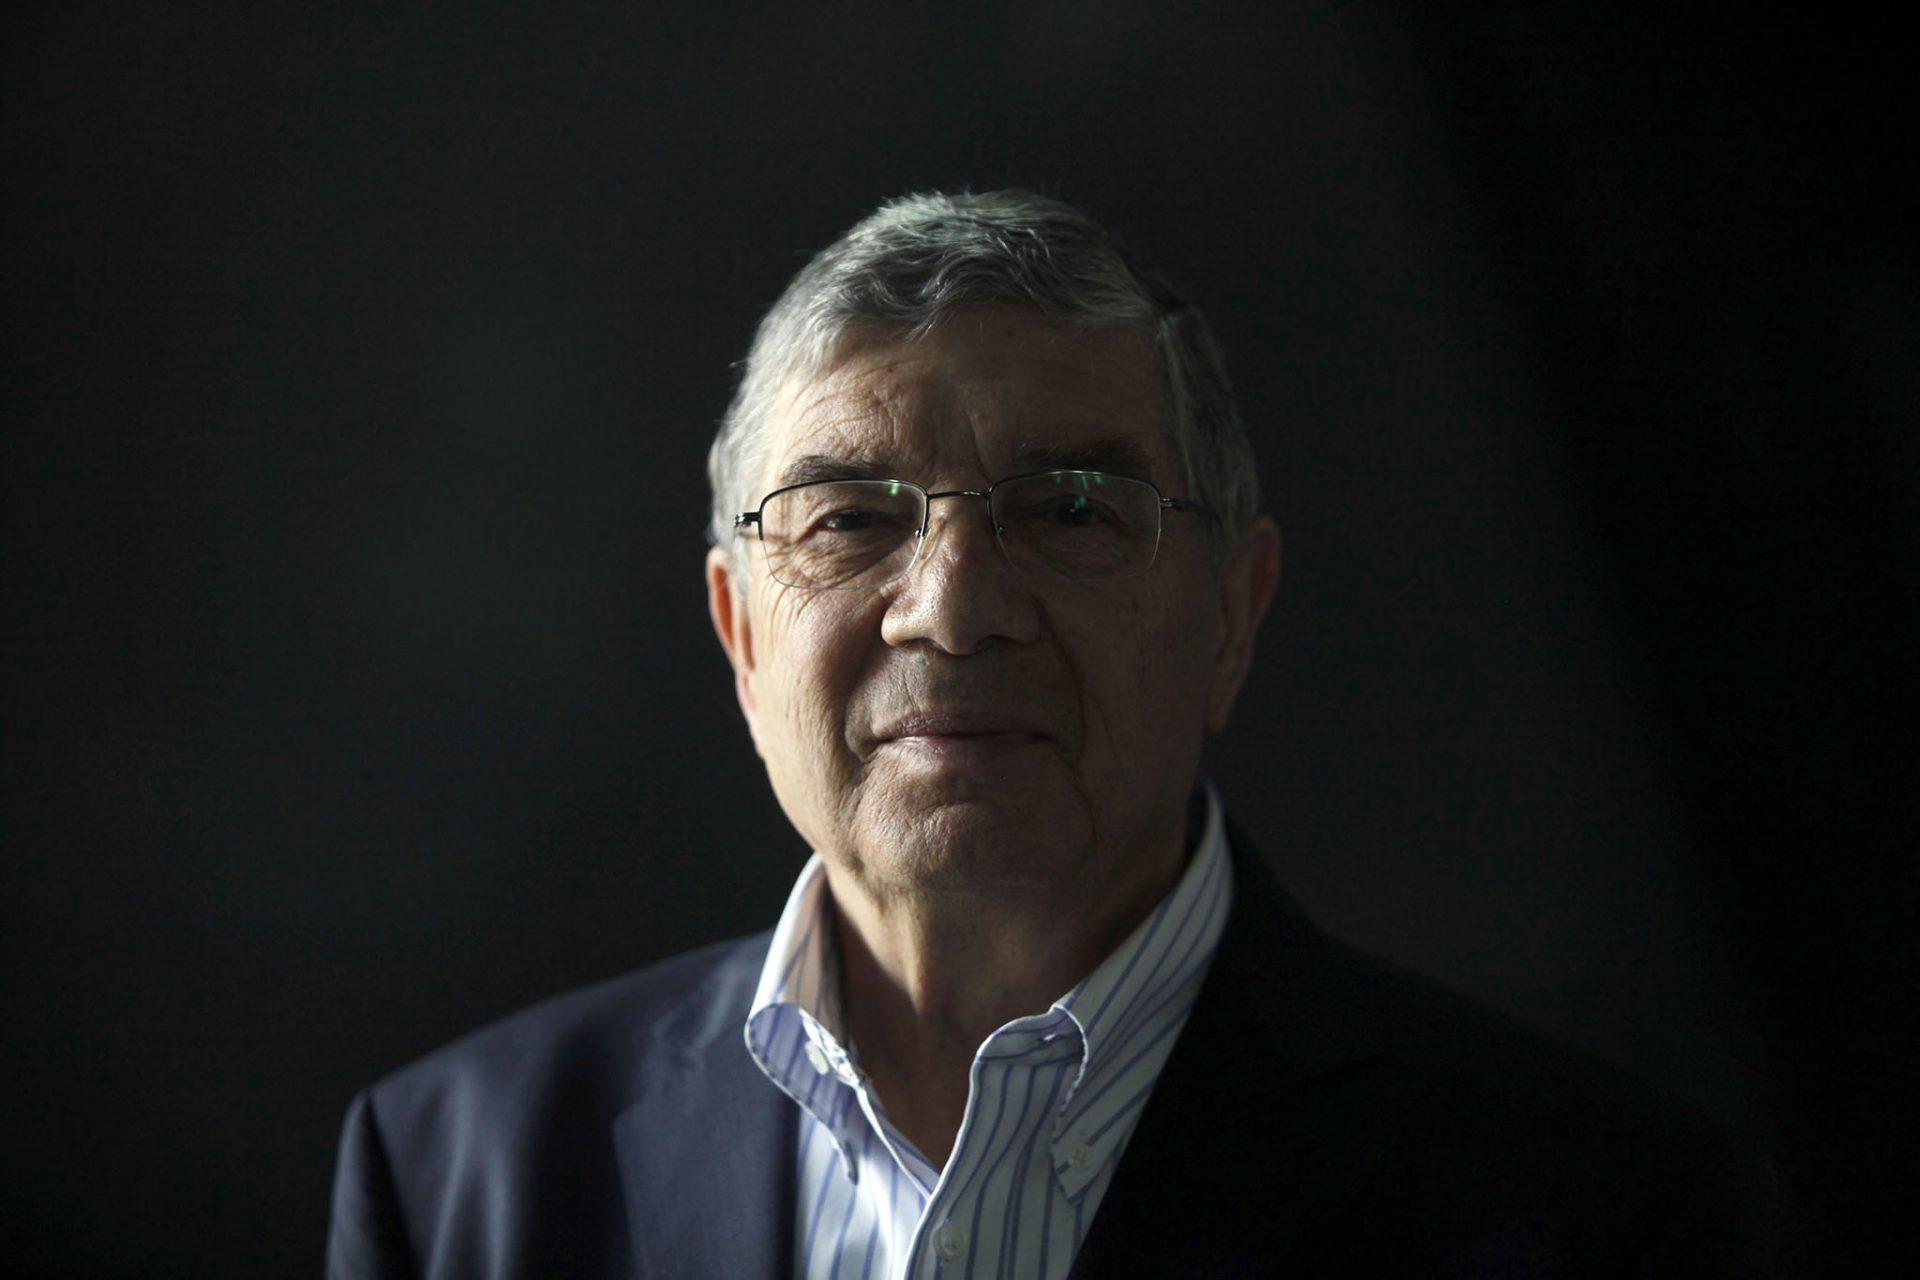 Avner Shalev 2013